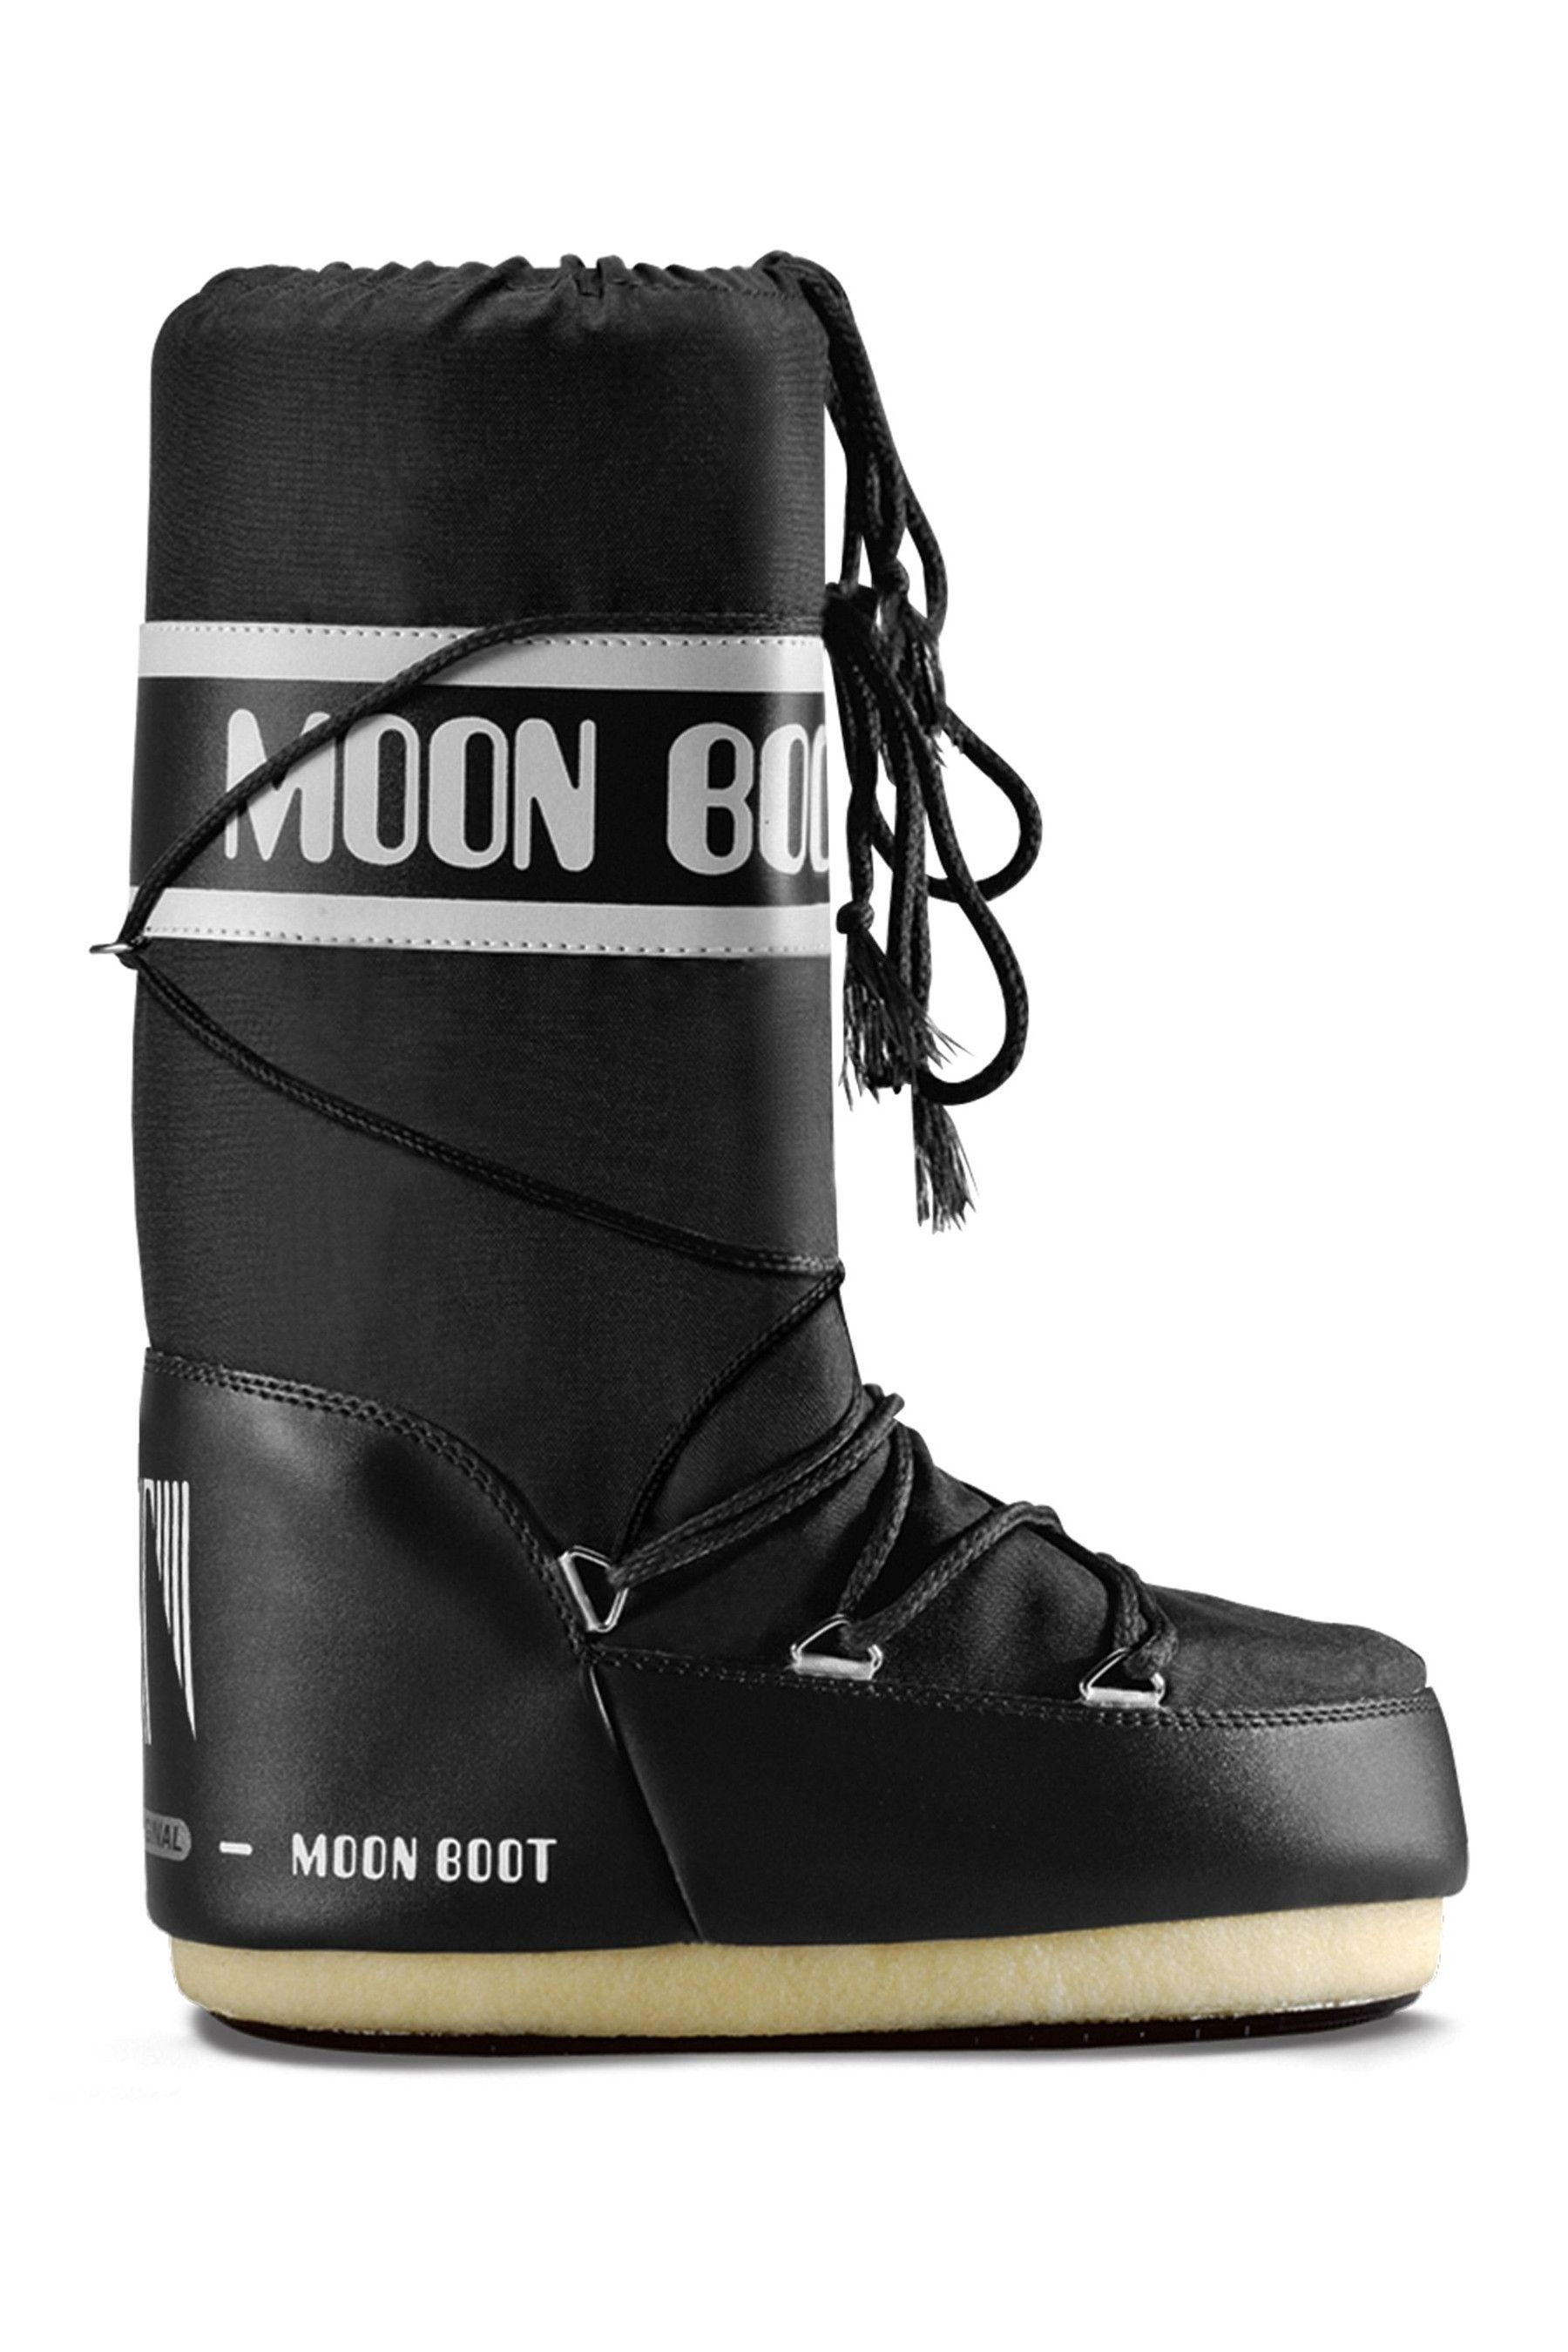 Womens Moonboots Classic Snow Boots Black | Moon boots